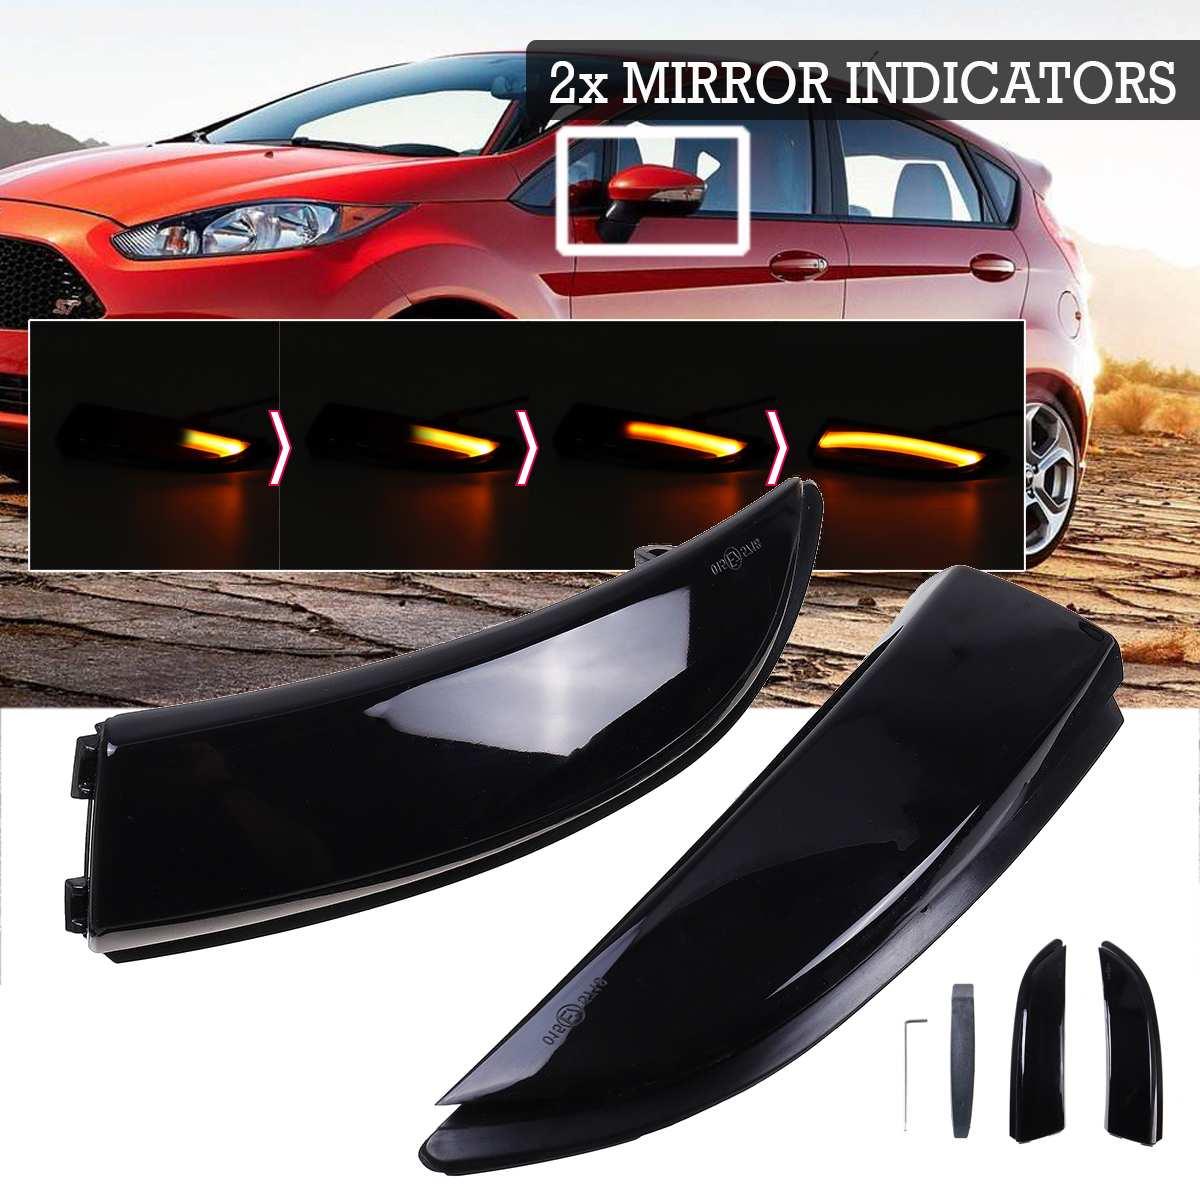 2x Lexus IS MK1 18-LED Rear Indicator Repeater Turn Signal Light Lamp Bulbs